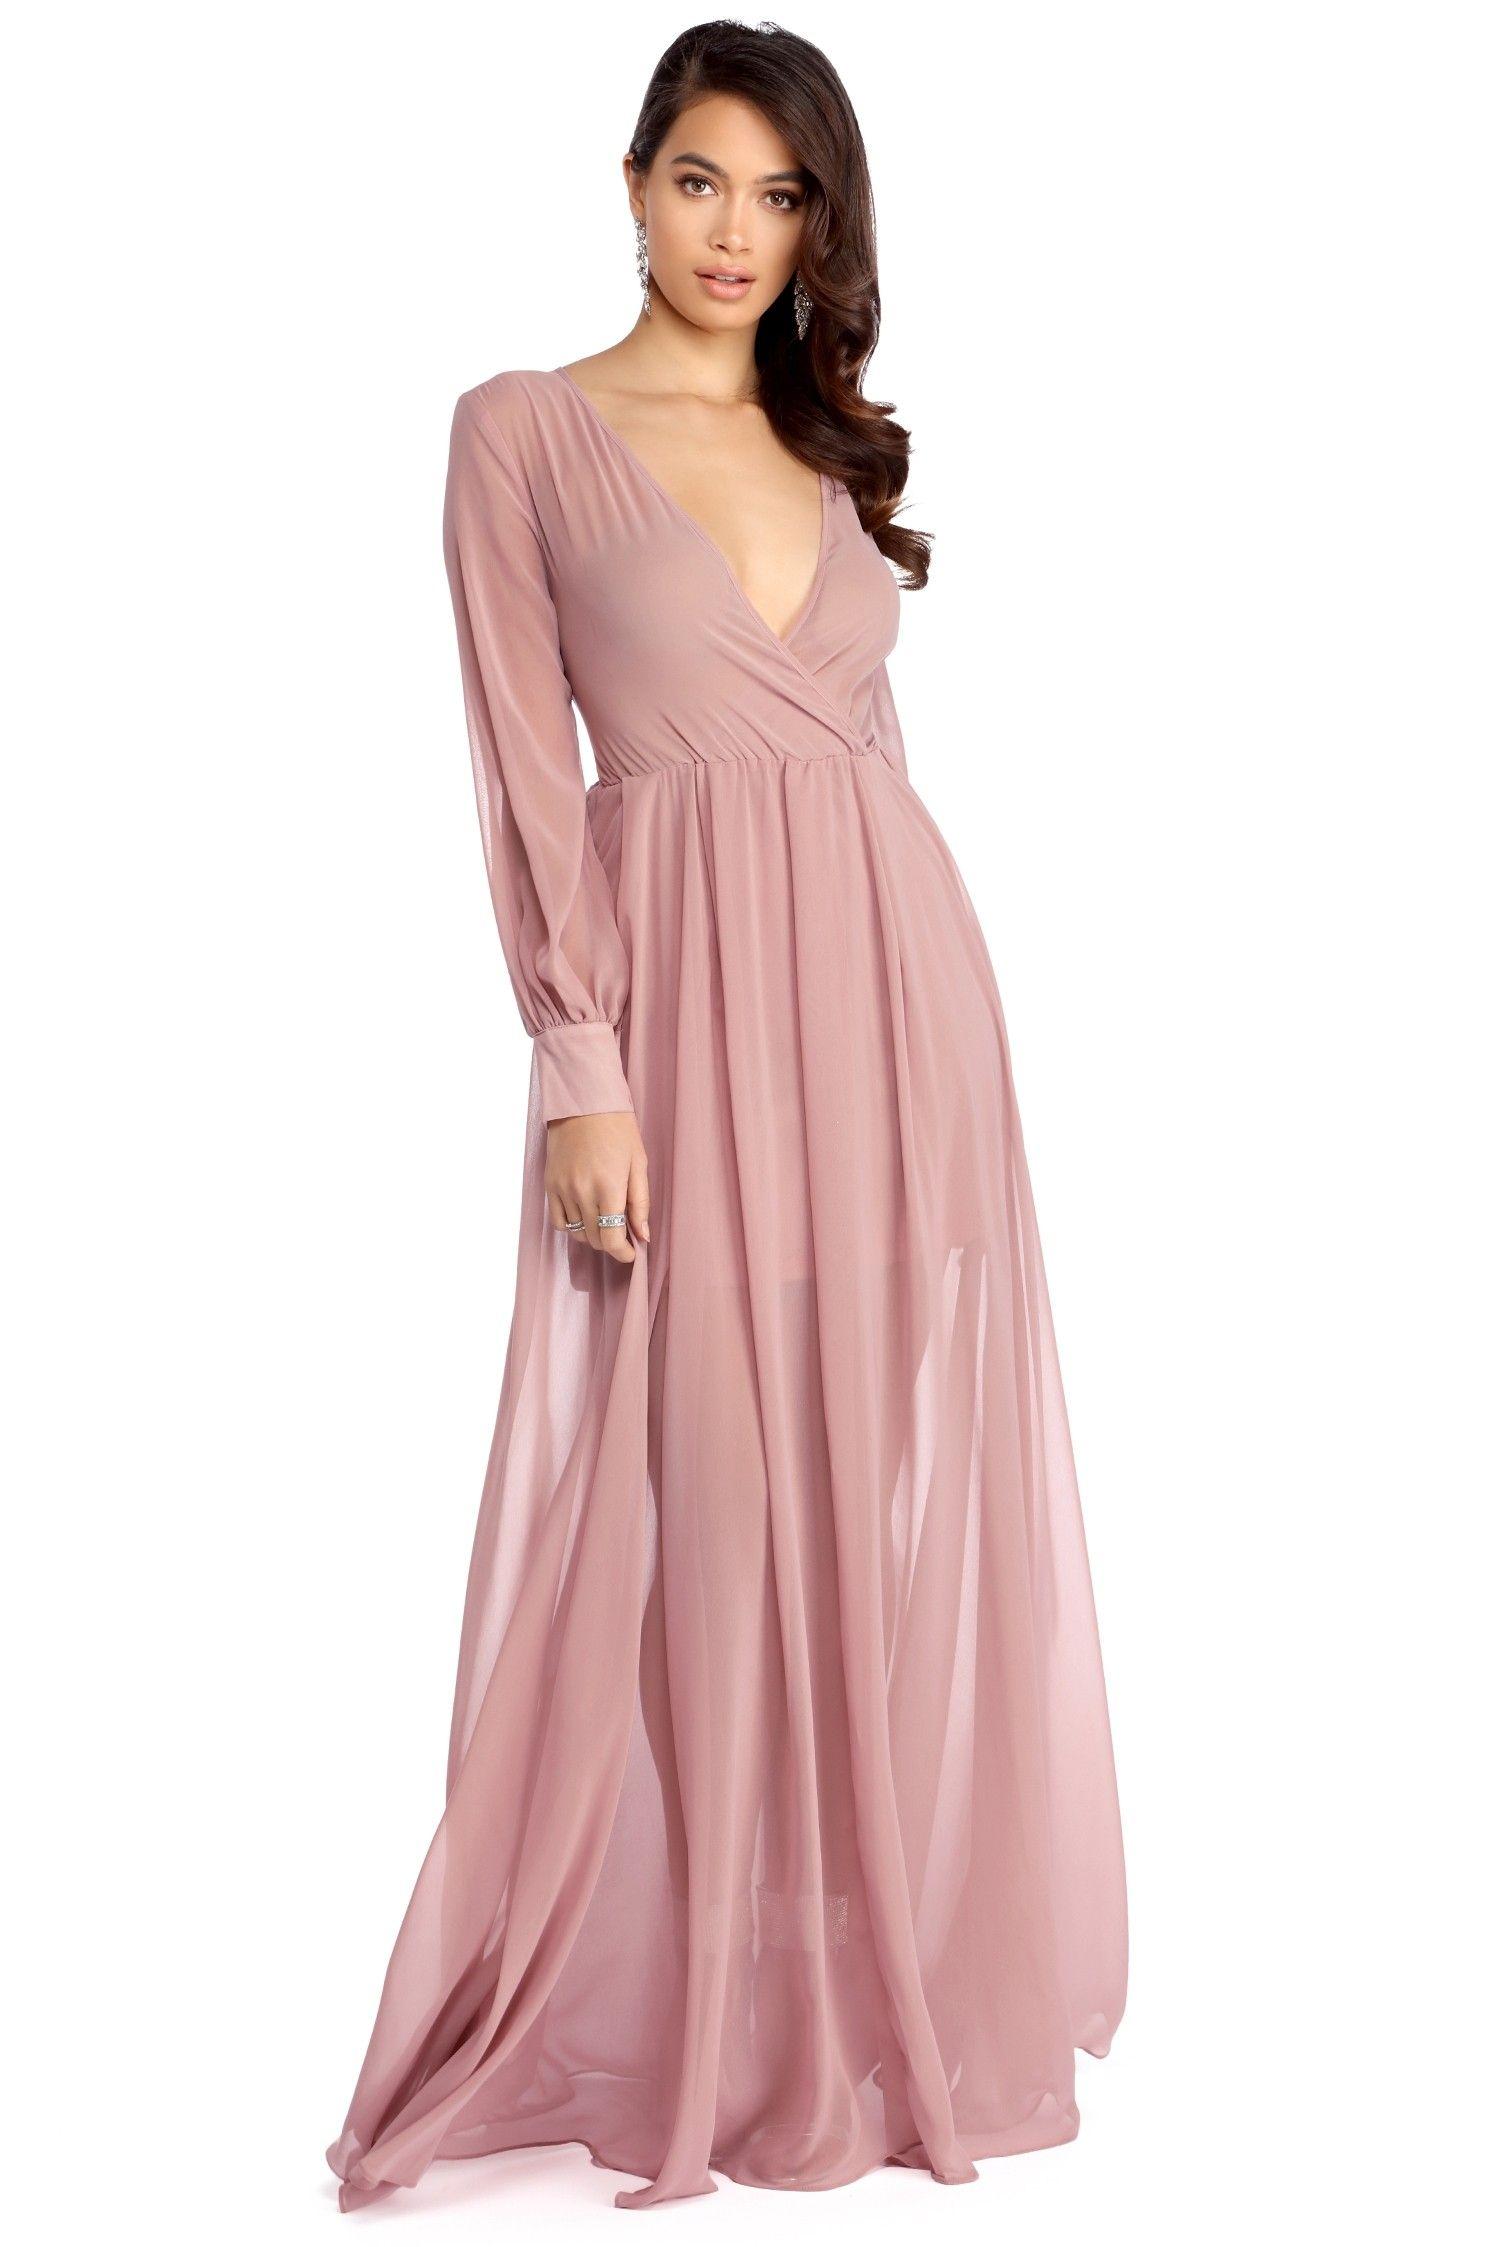 Default View Maxi Dress With Sleeves Chiffon Wrap Dress Flowy Maxi Dress [ 2247 x 1500 Pixel ]